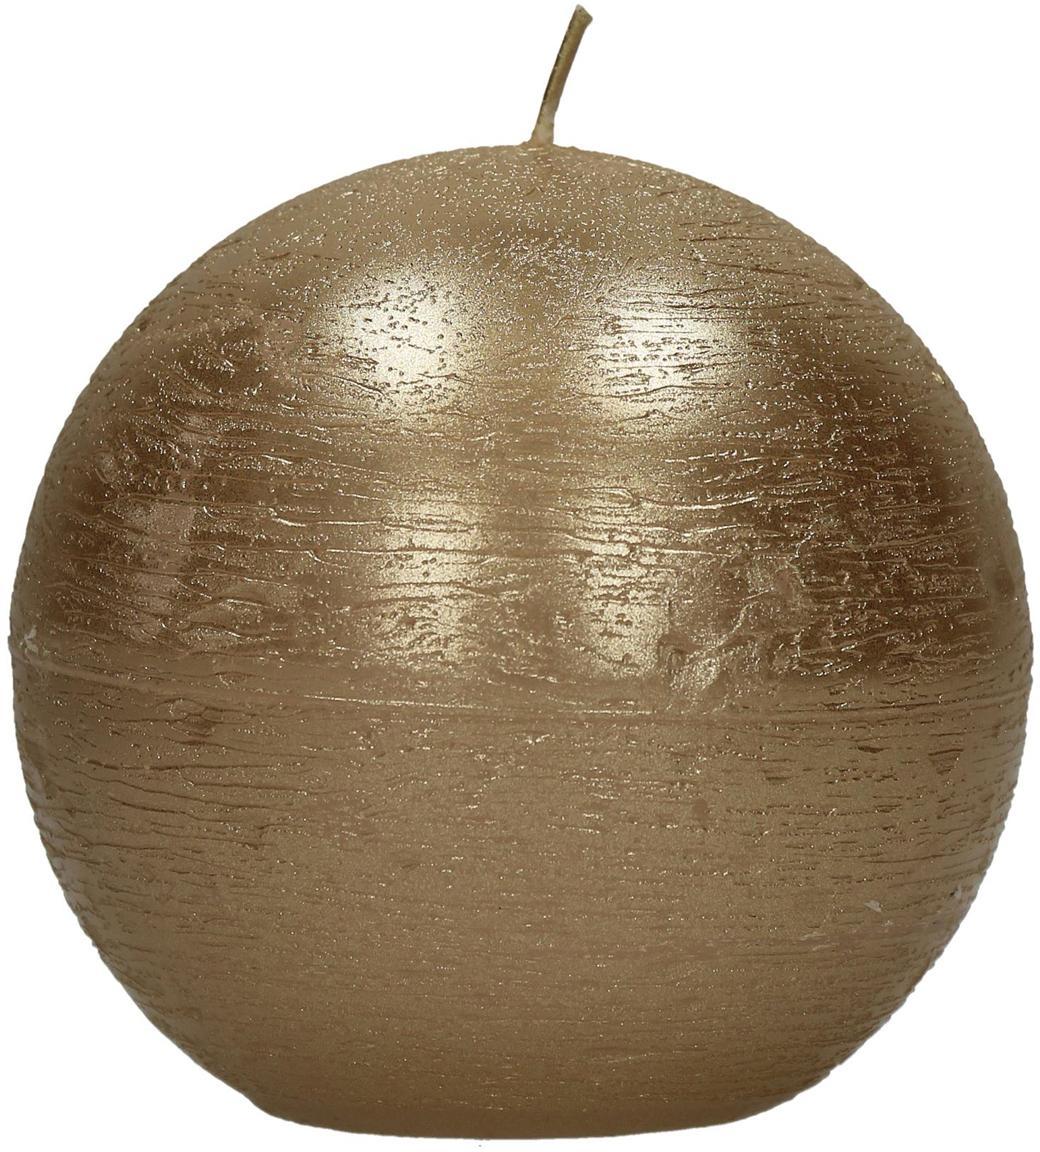 Vela Ergene, 80%parafina, 20%cera de palma, Champán, Ø 9 x Al 9 cm